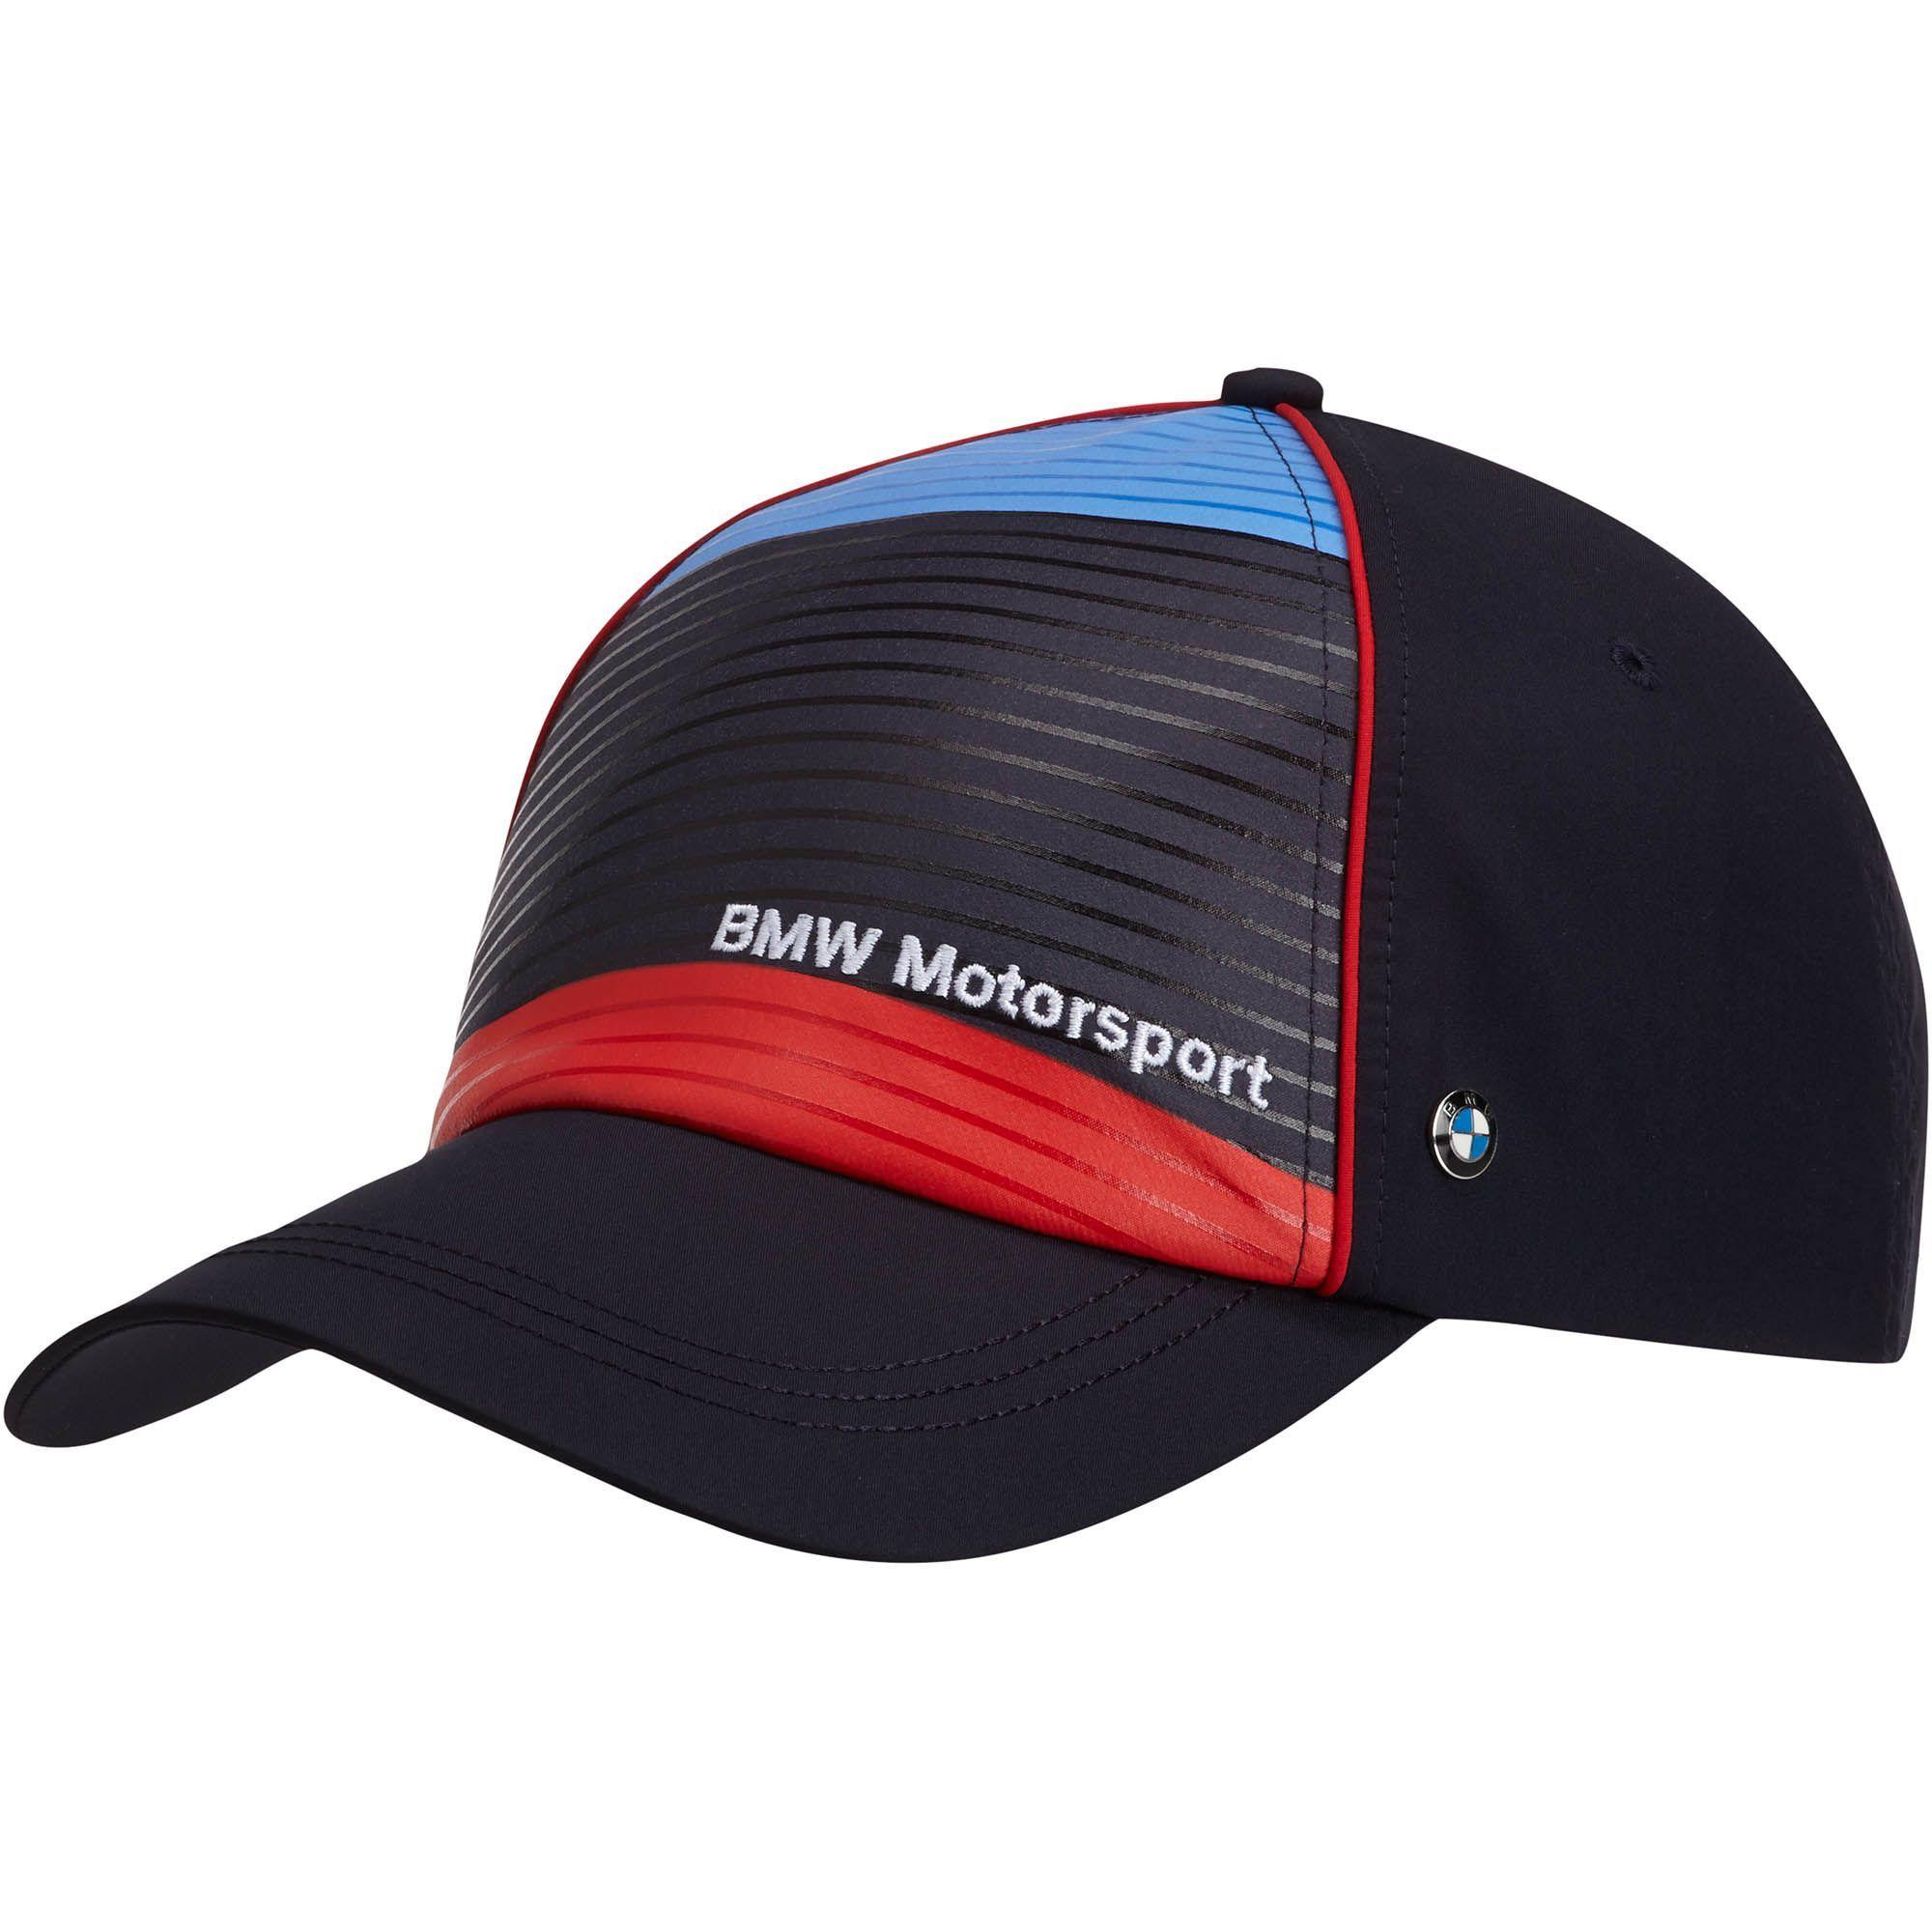 black p bmw logo cap m sport